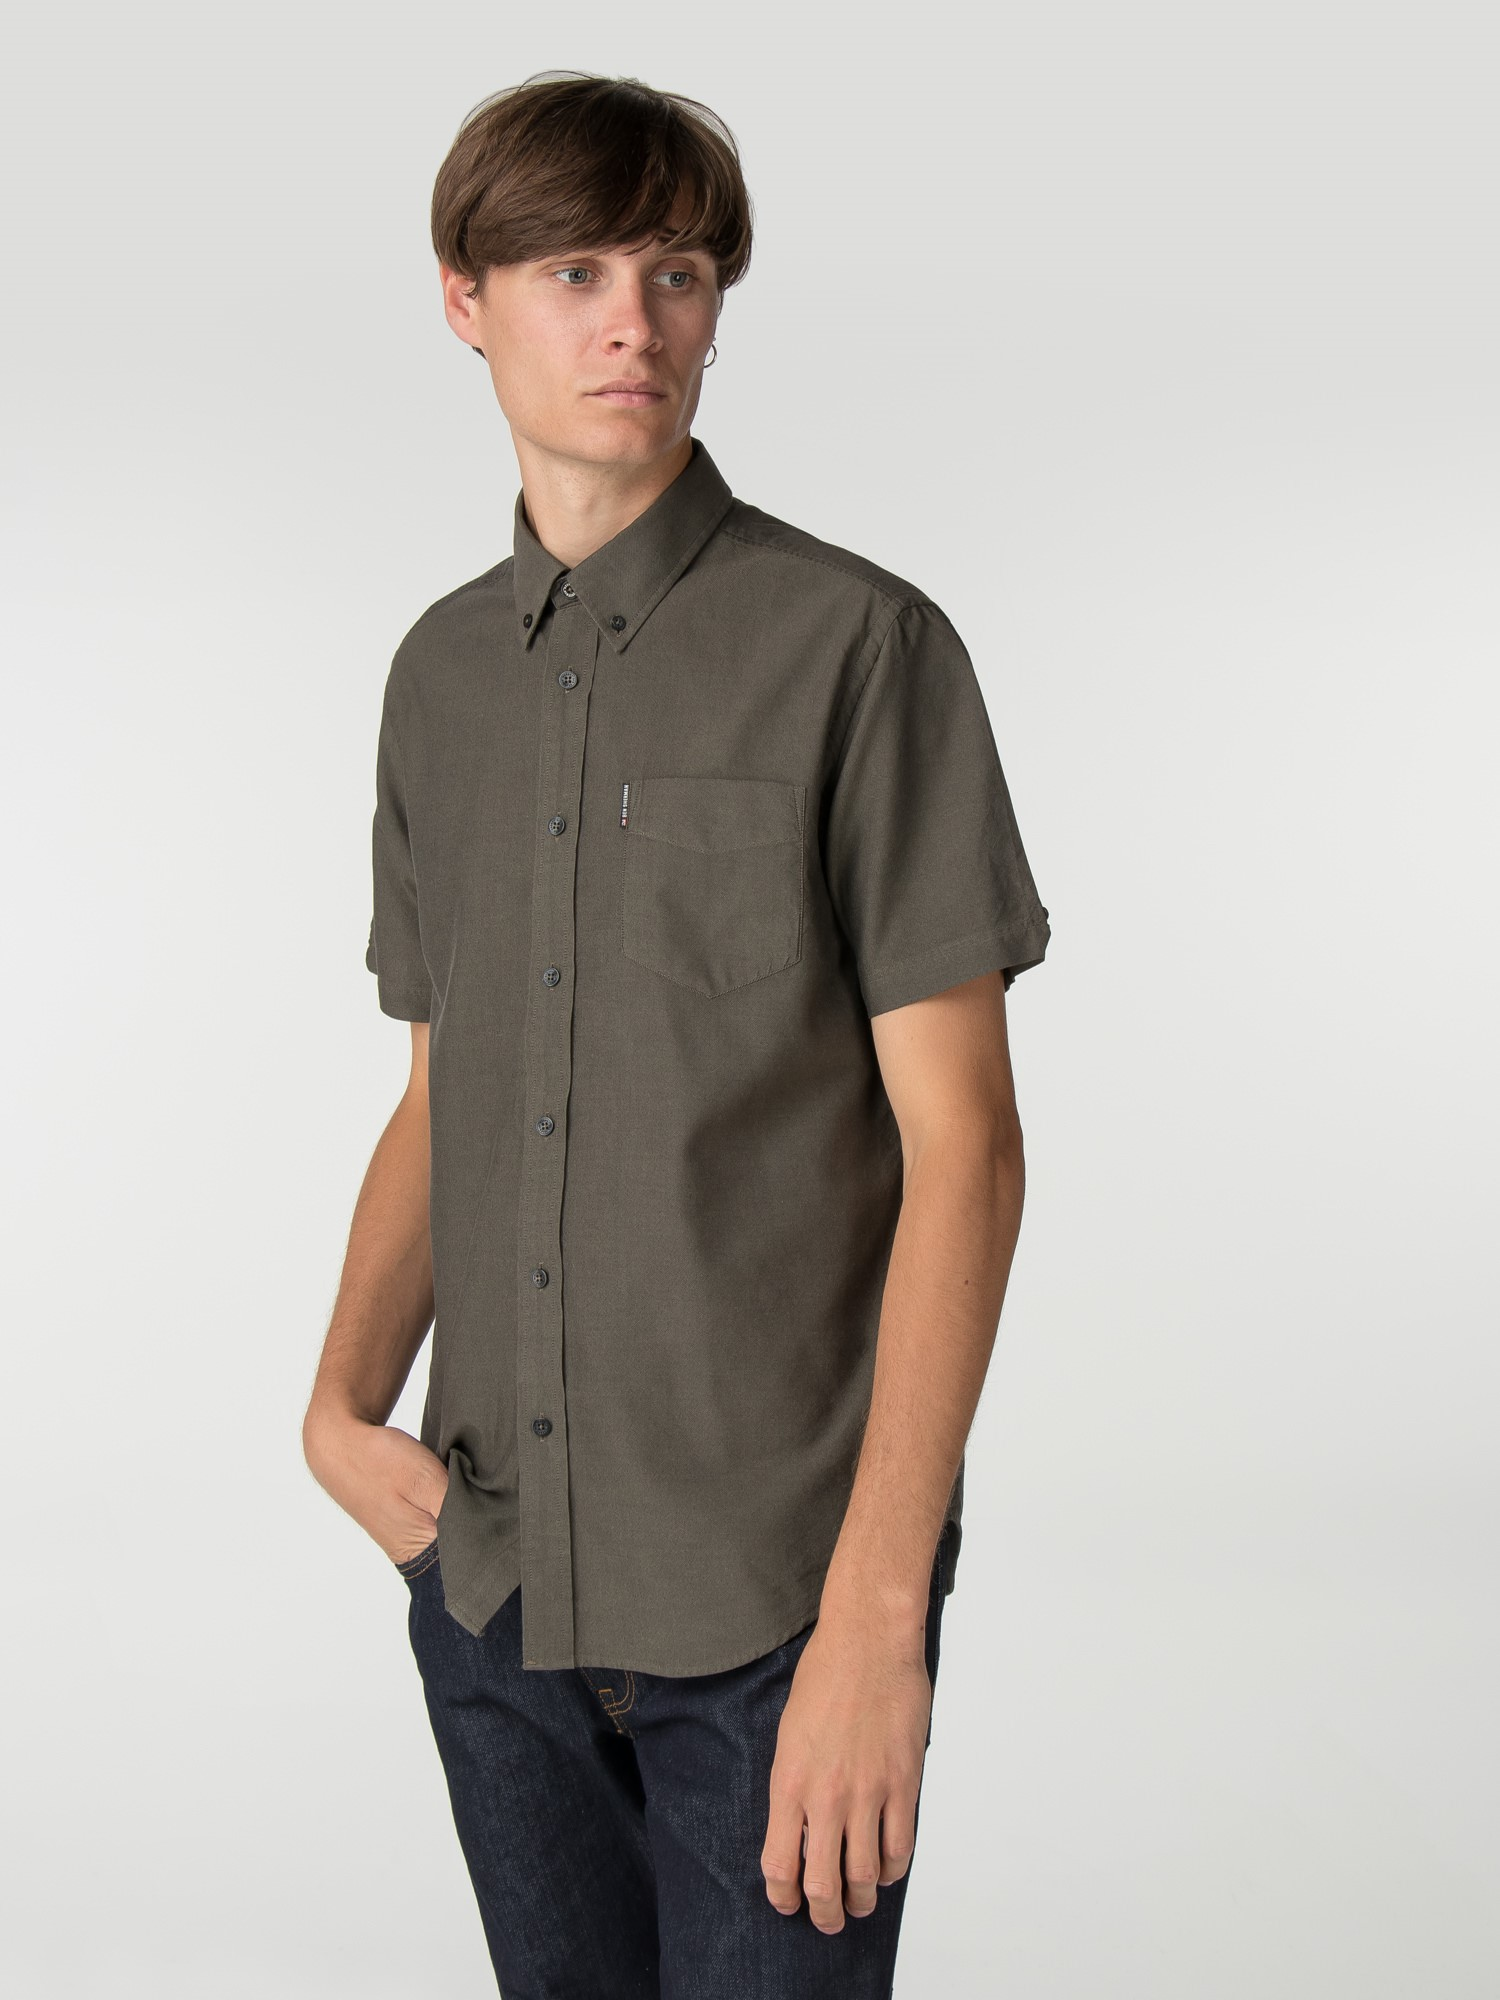 Mens Oxford Shirt by Ben Sherman Short Sleeved